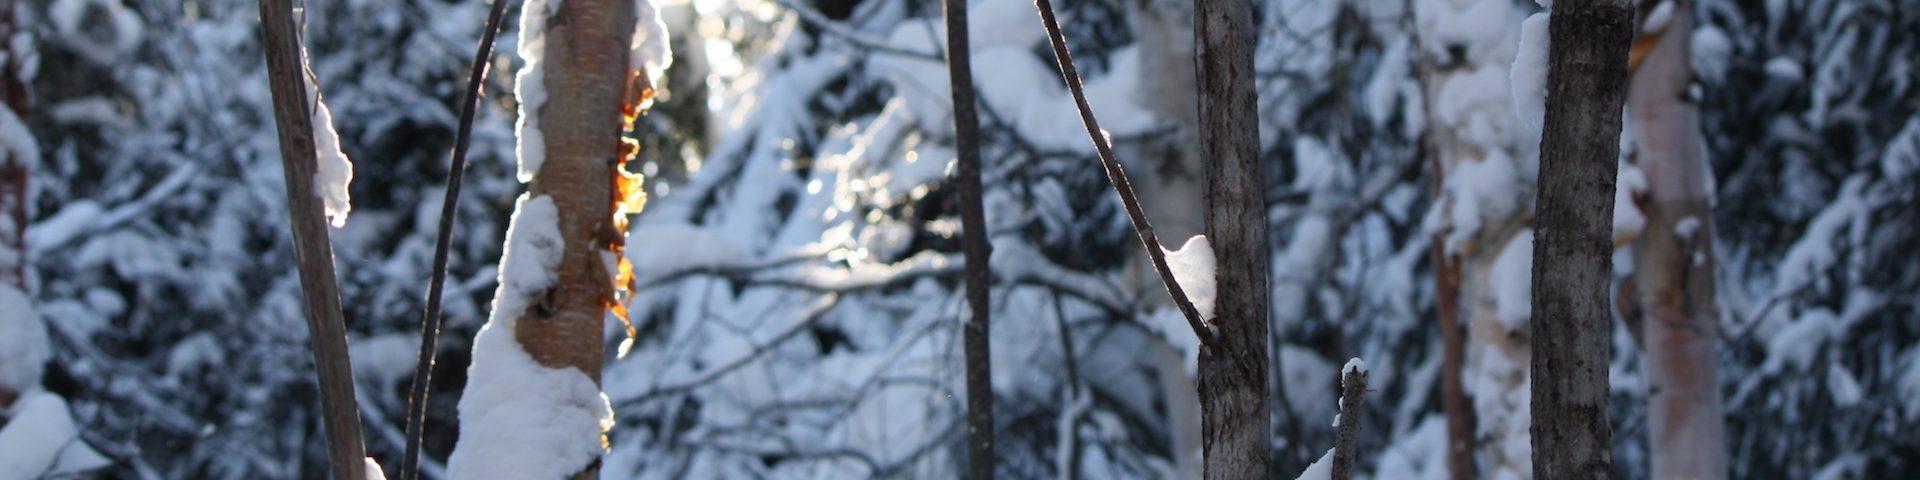 sun shining through snowy trees